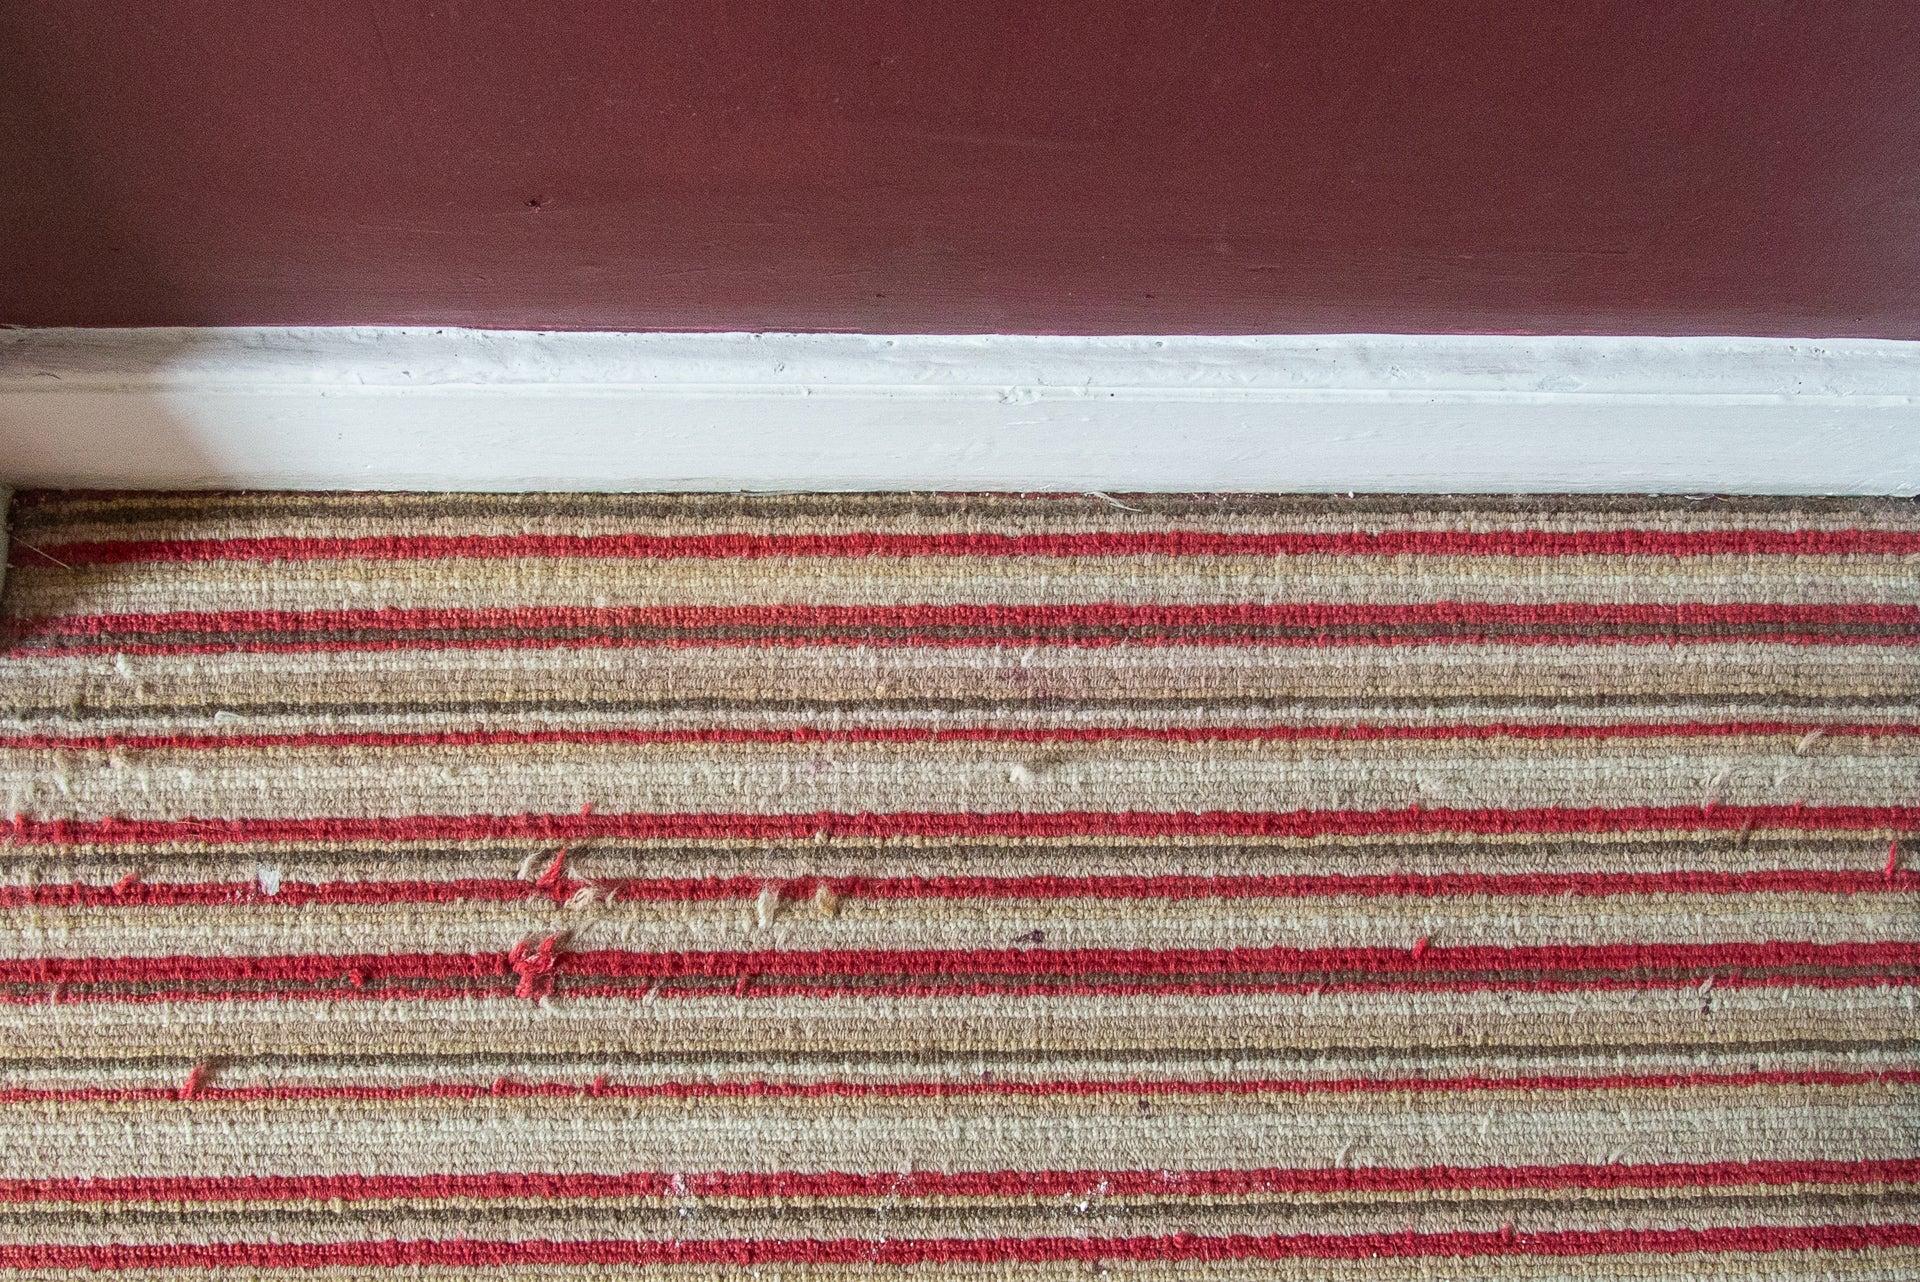 Vorwerk Kobold VB100 carpet clean